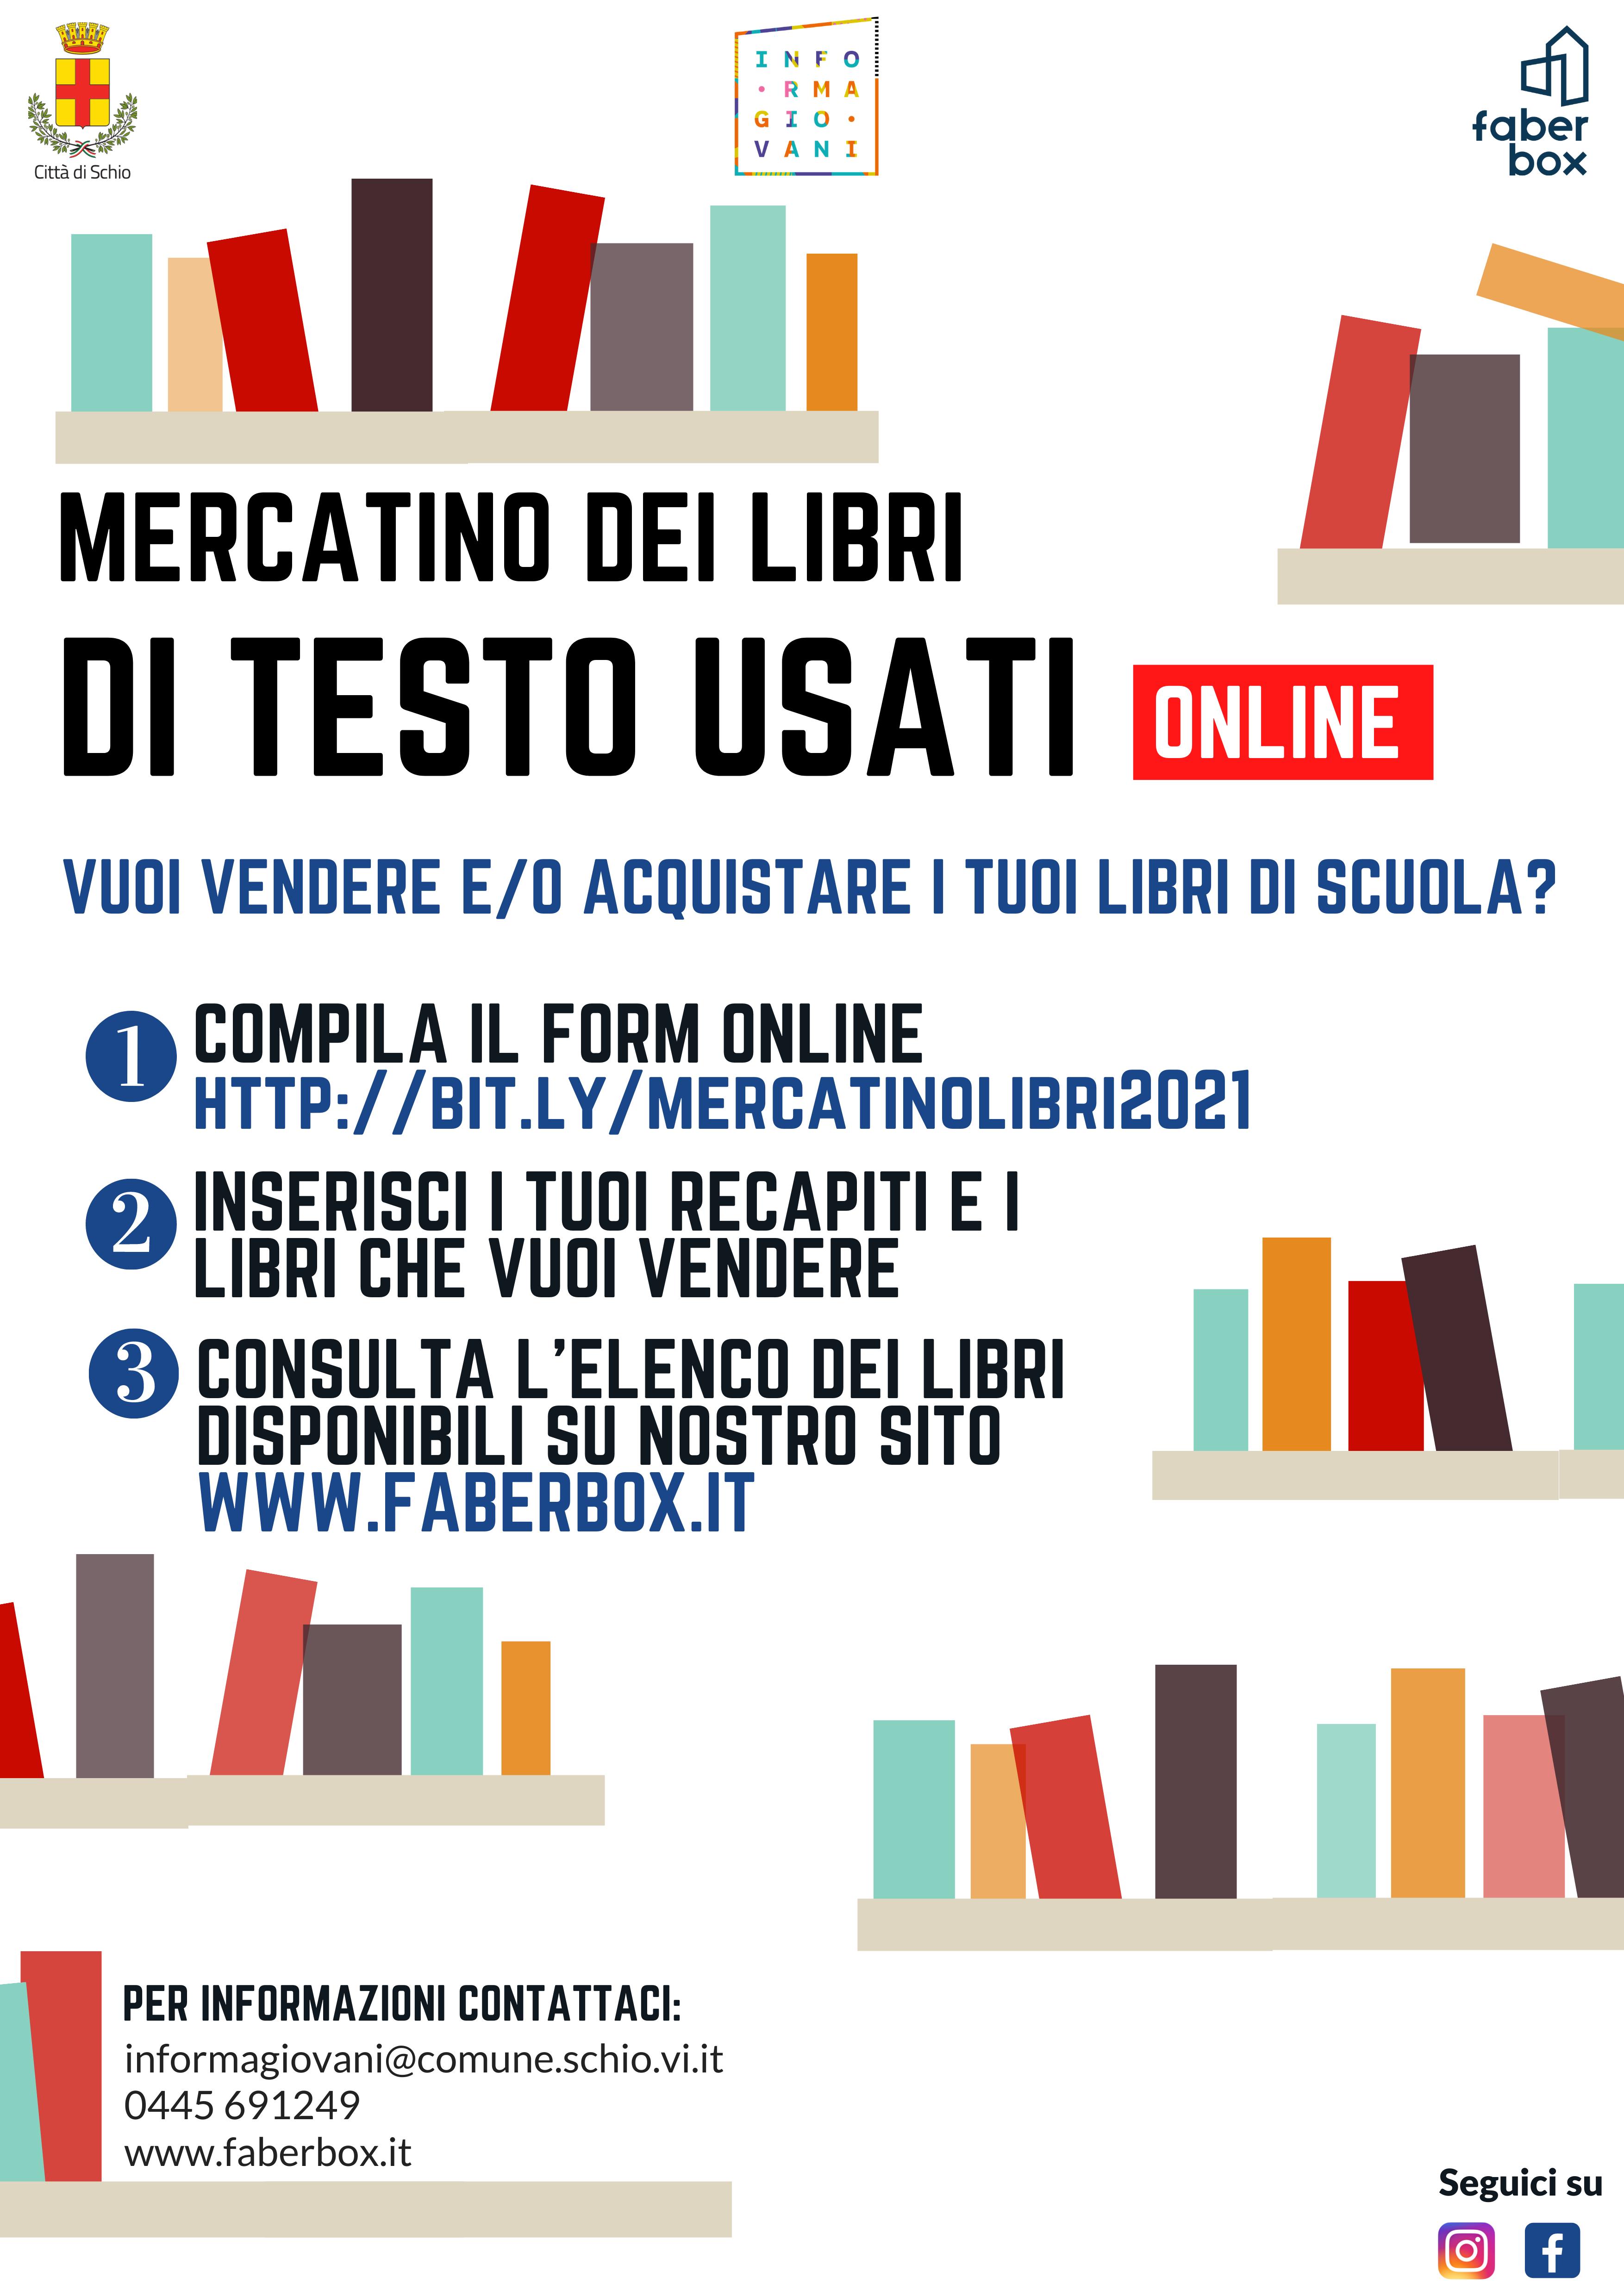 Mercatino dei libri usati online! [2021]